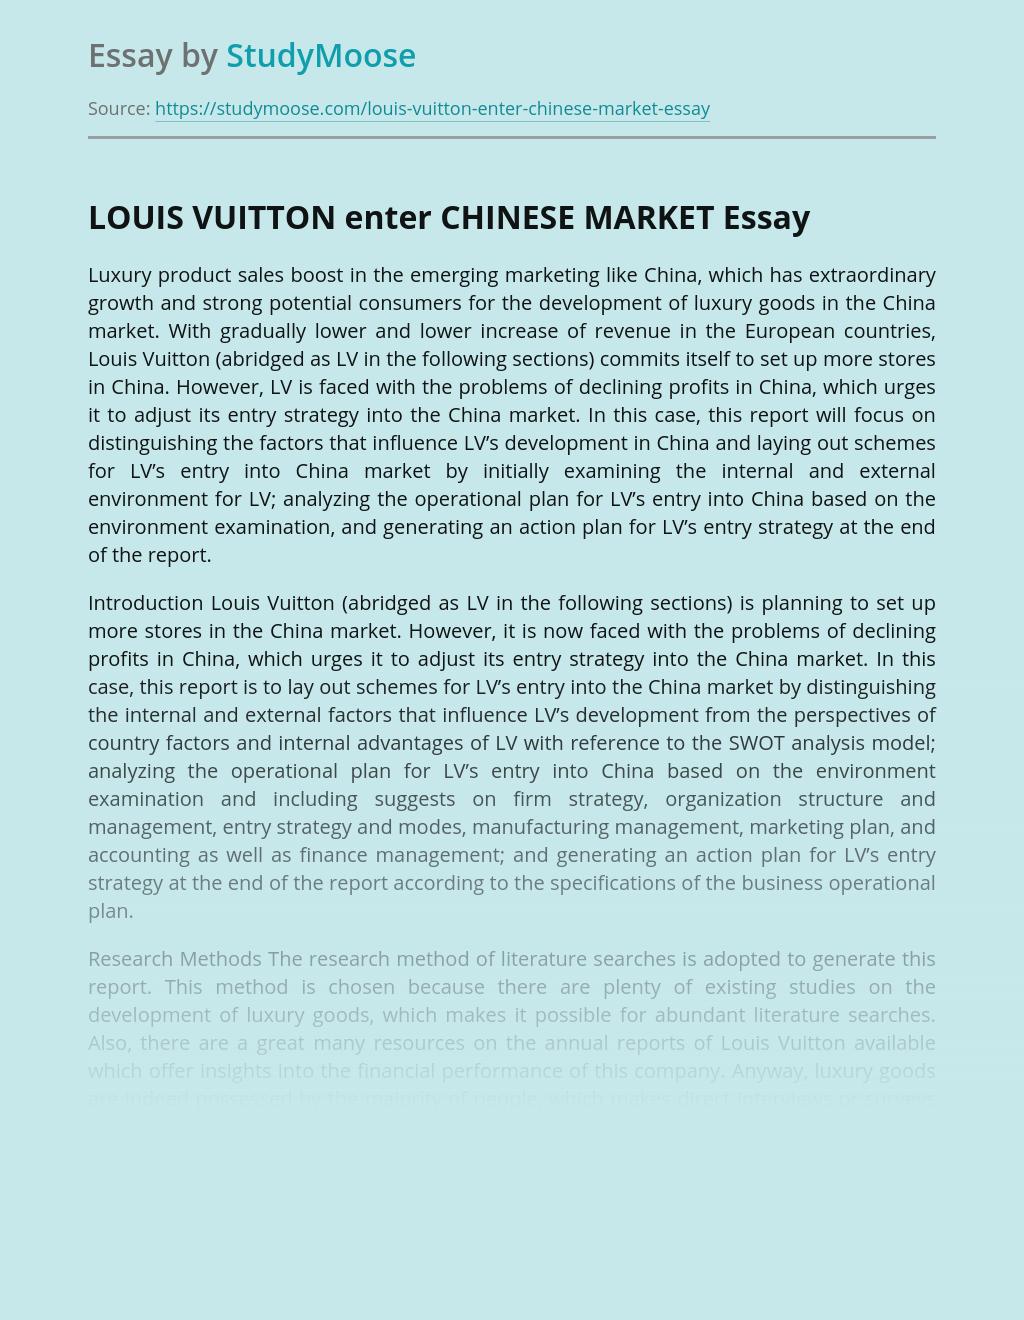 Fashion Marketing of Louis Vuitton at Chinese Market